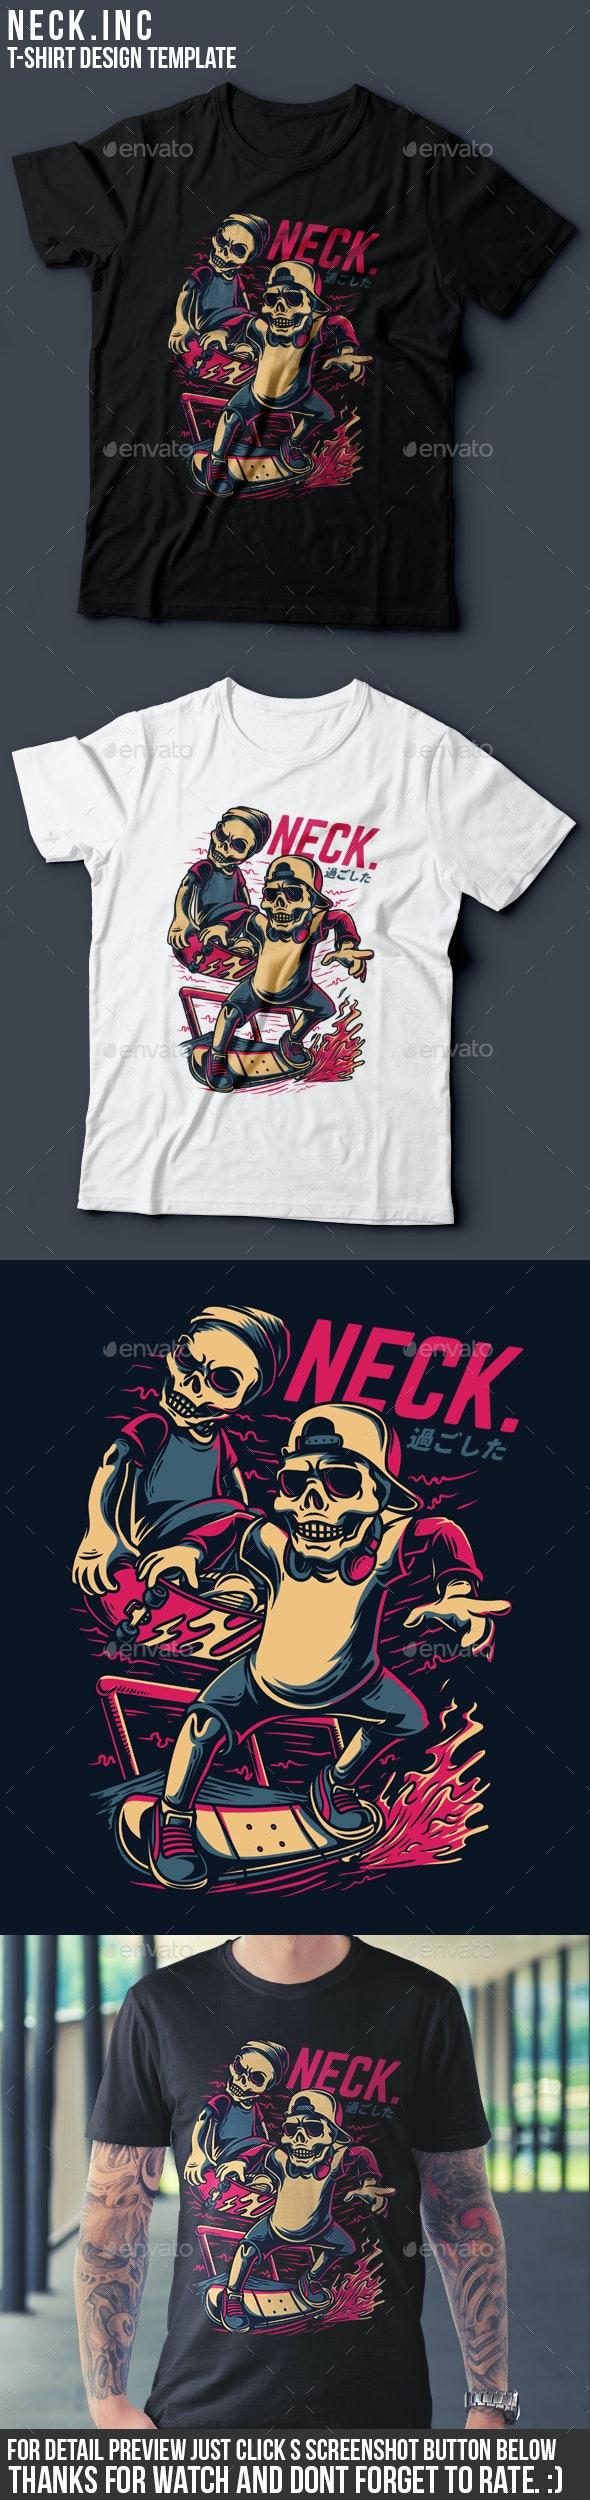 Neck.inc T-Shirt Design - Funny Designs